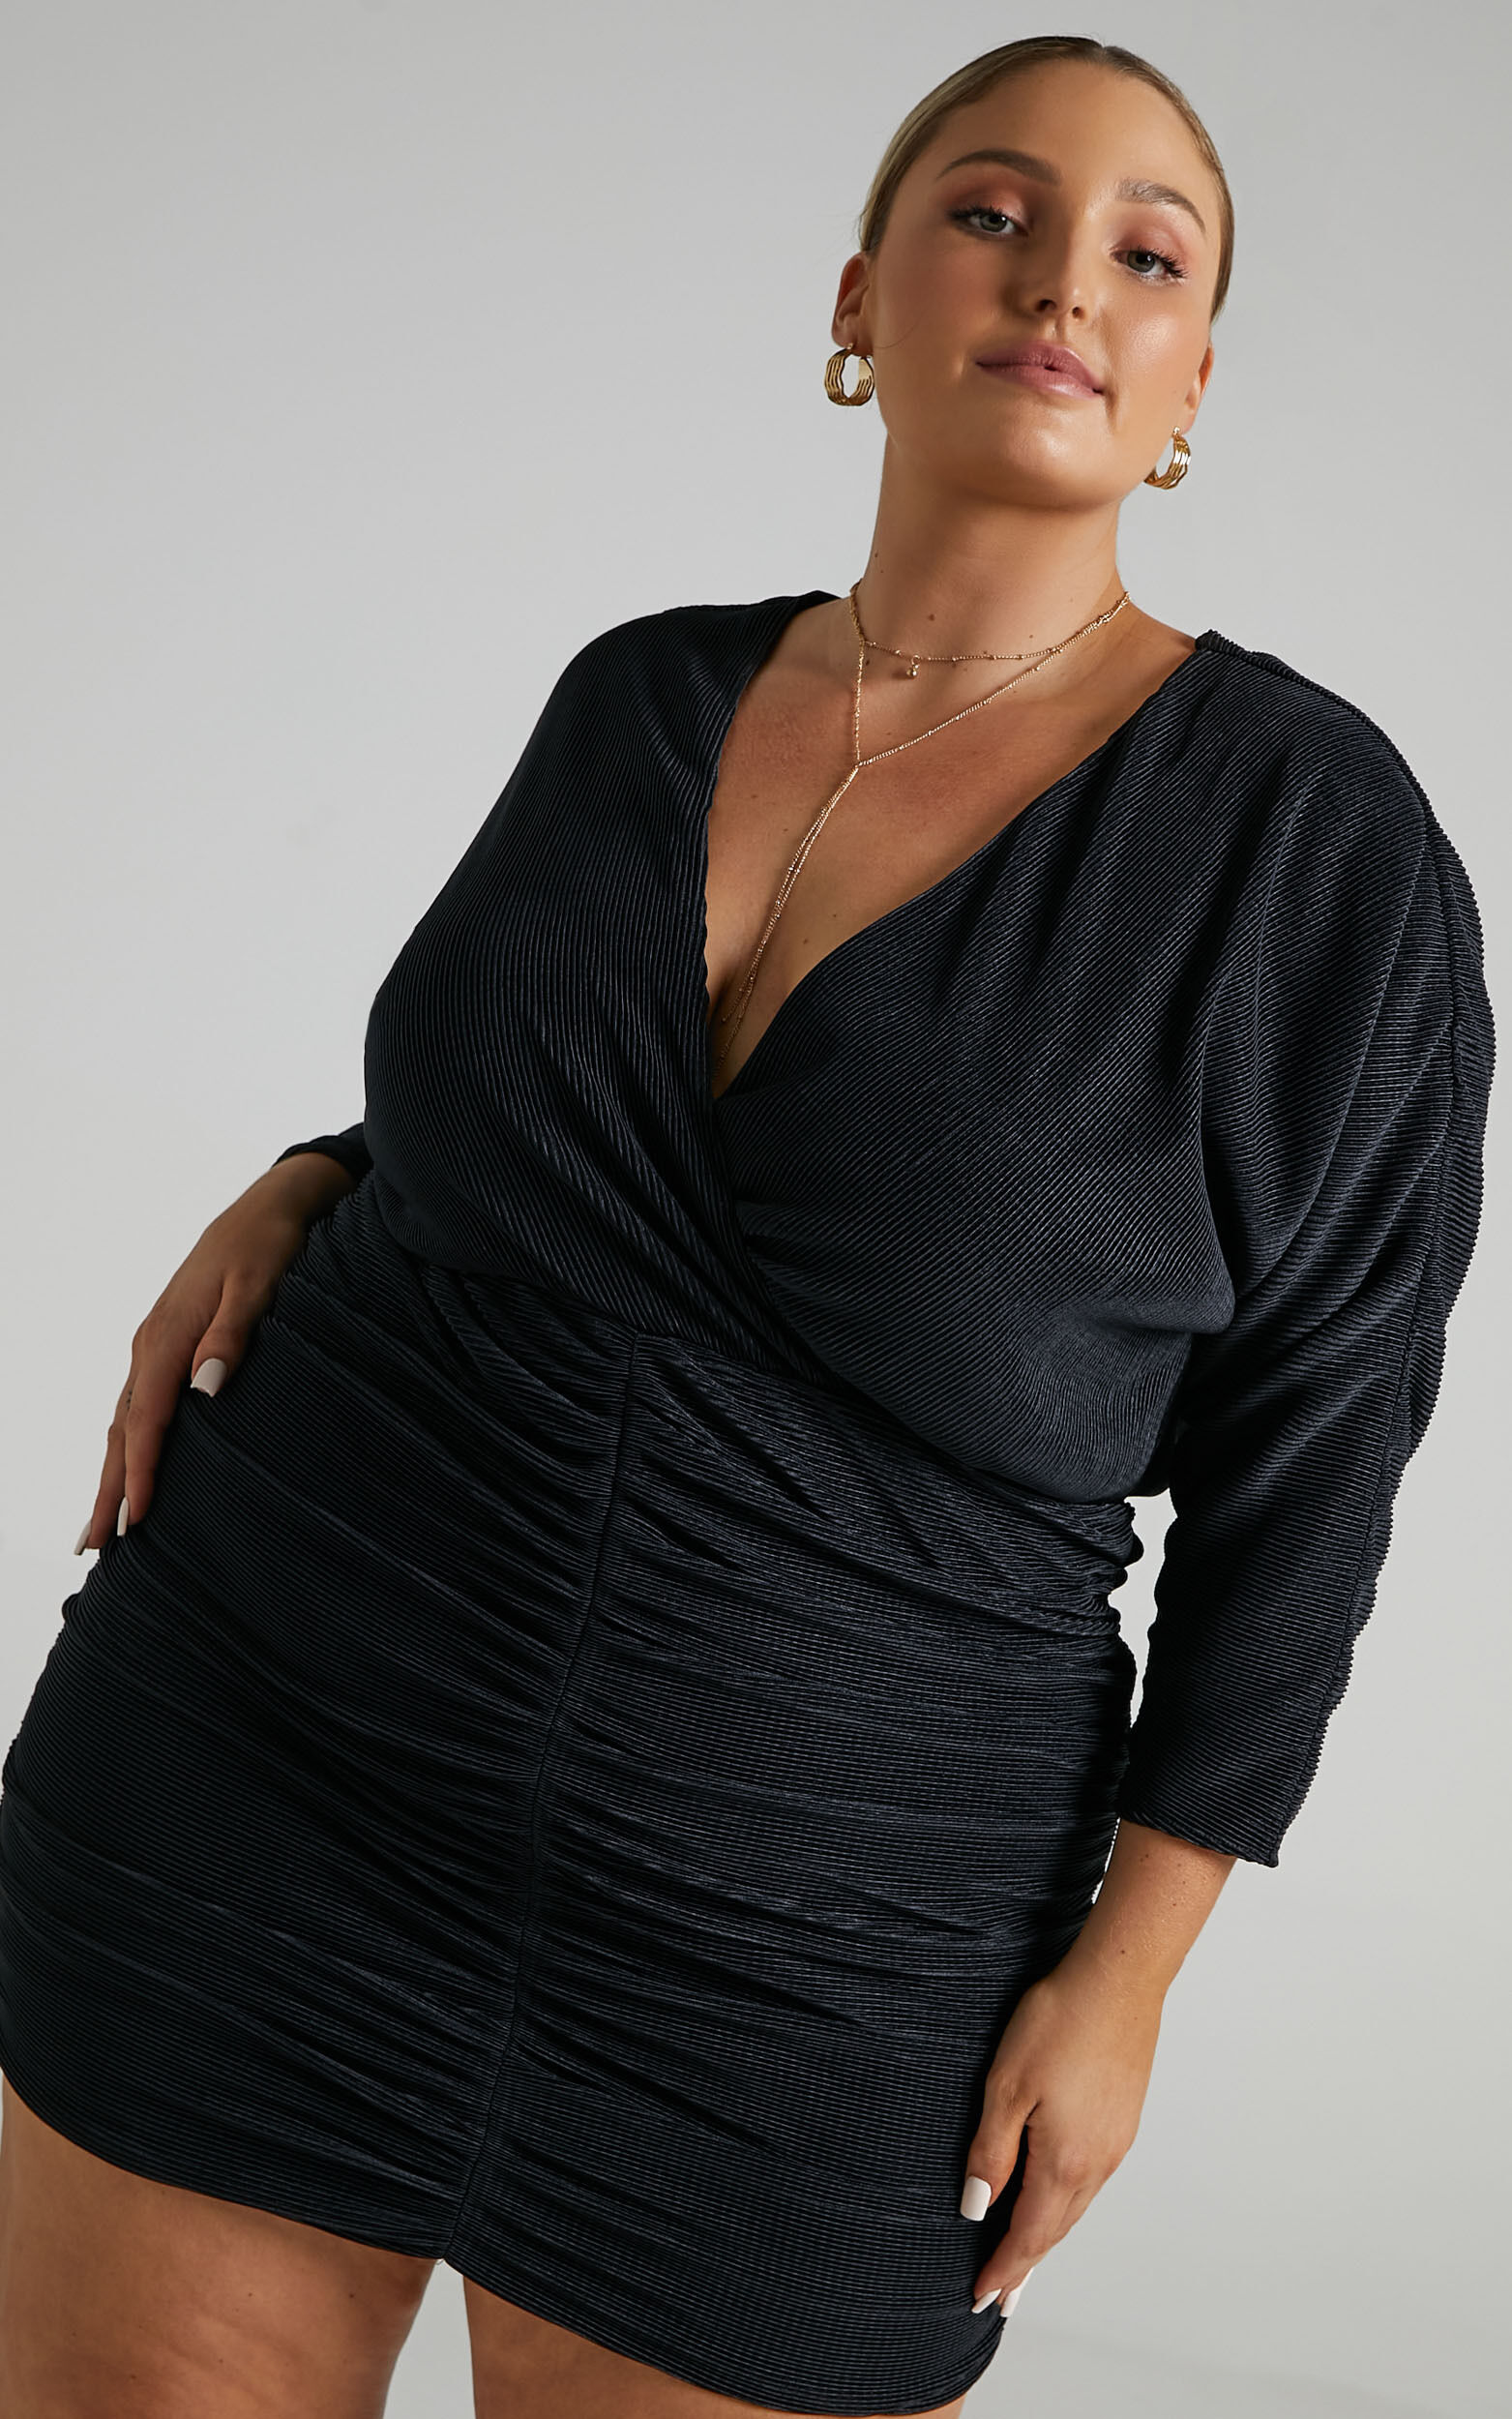 Axton Pleated Plunge Neckline Mini Dress in Black - 04, BLK1, super-hi-res image number null